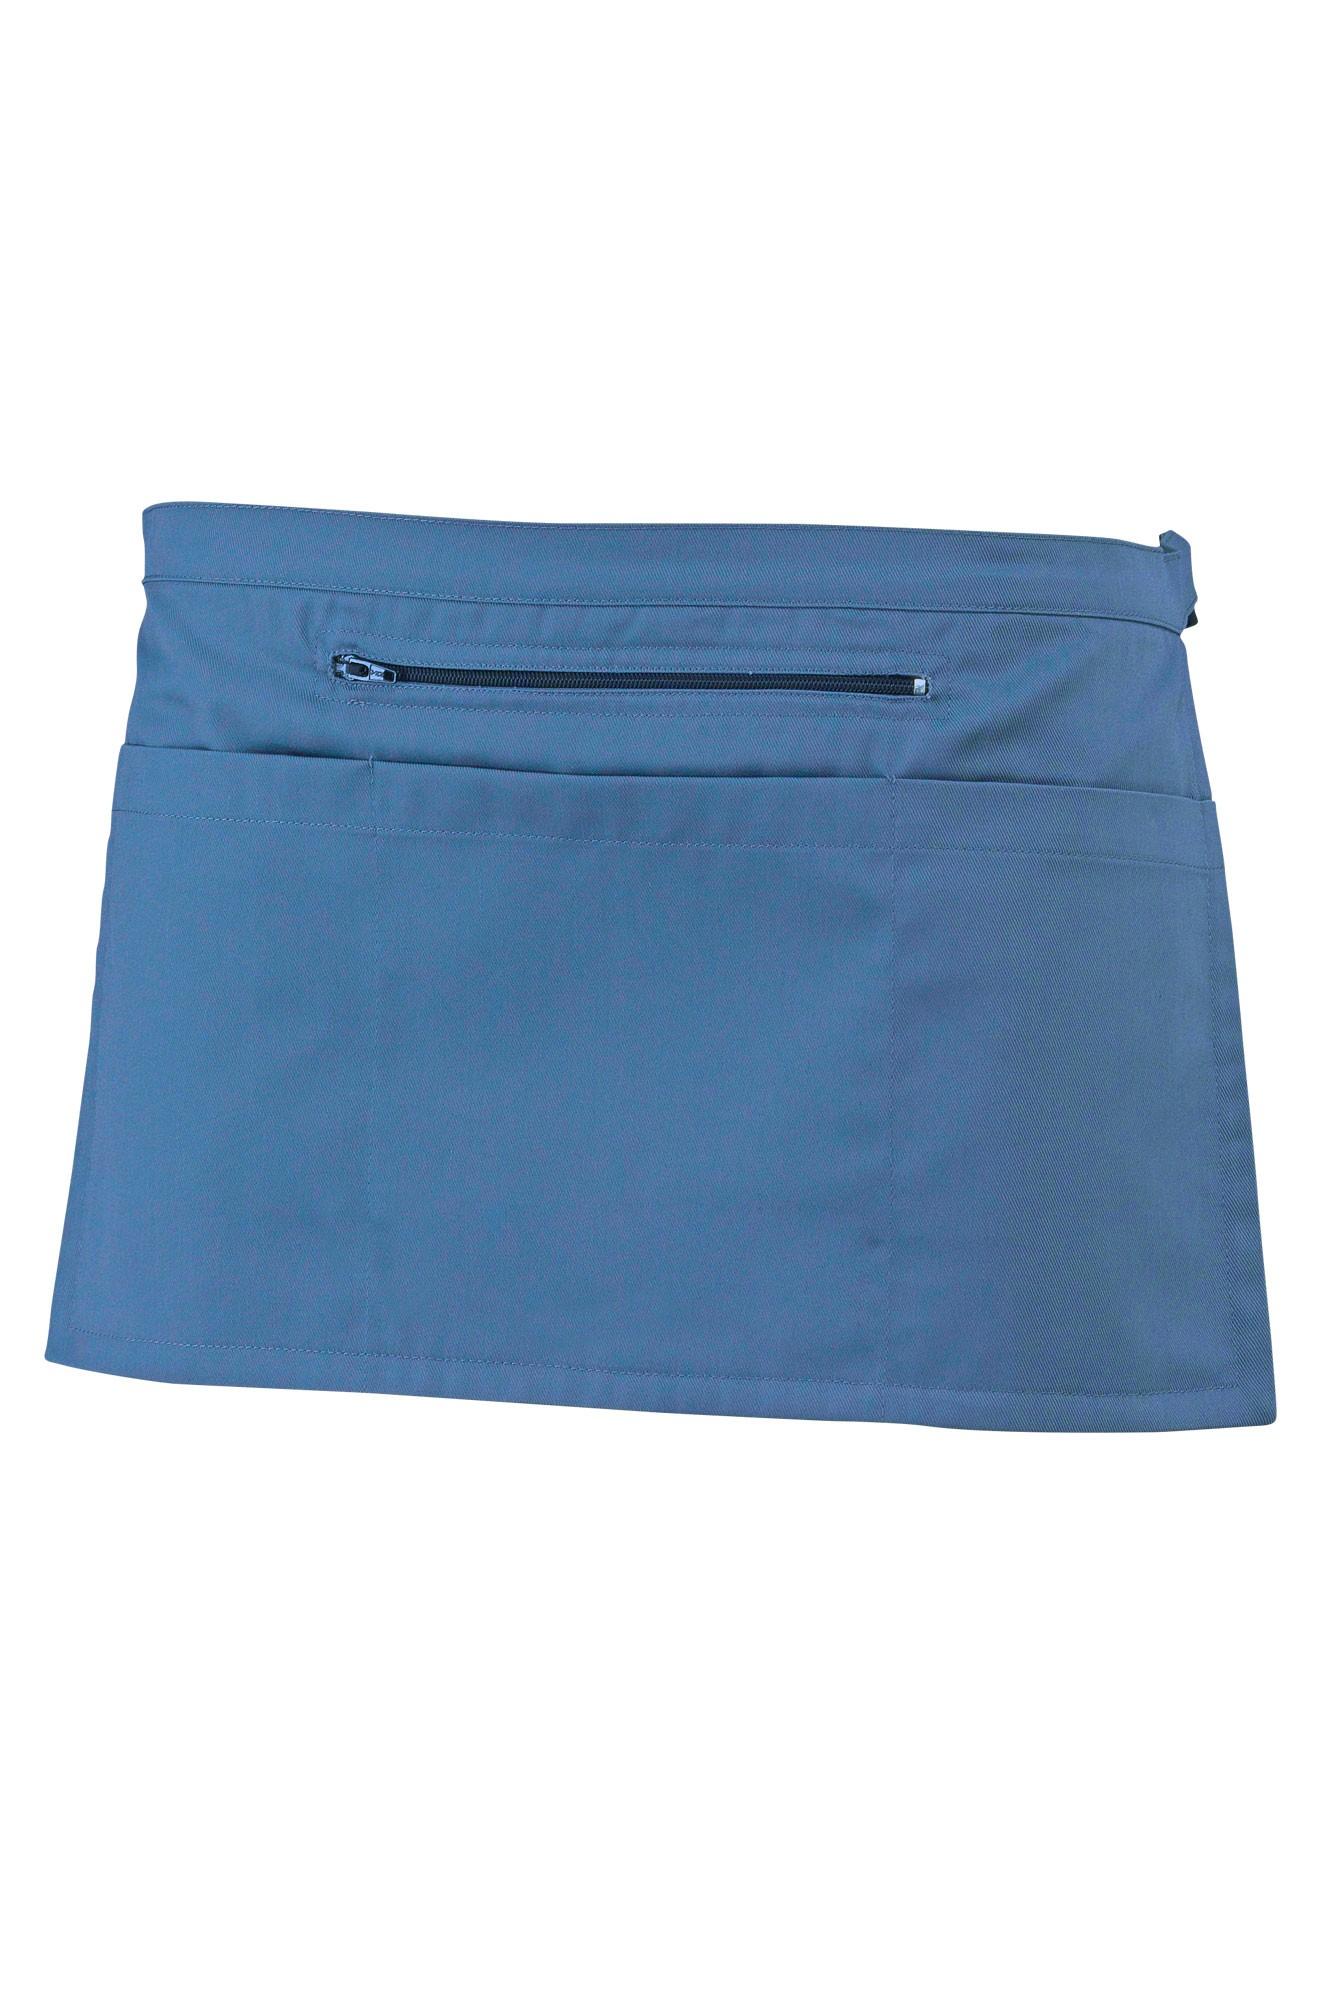 Kapsa s opaskem - modrá